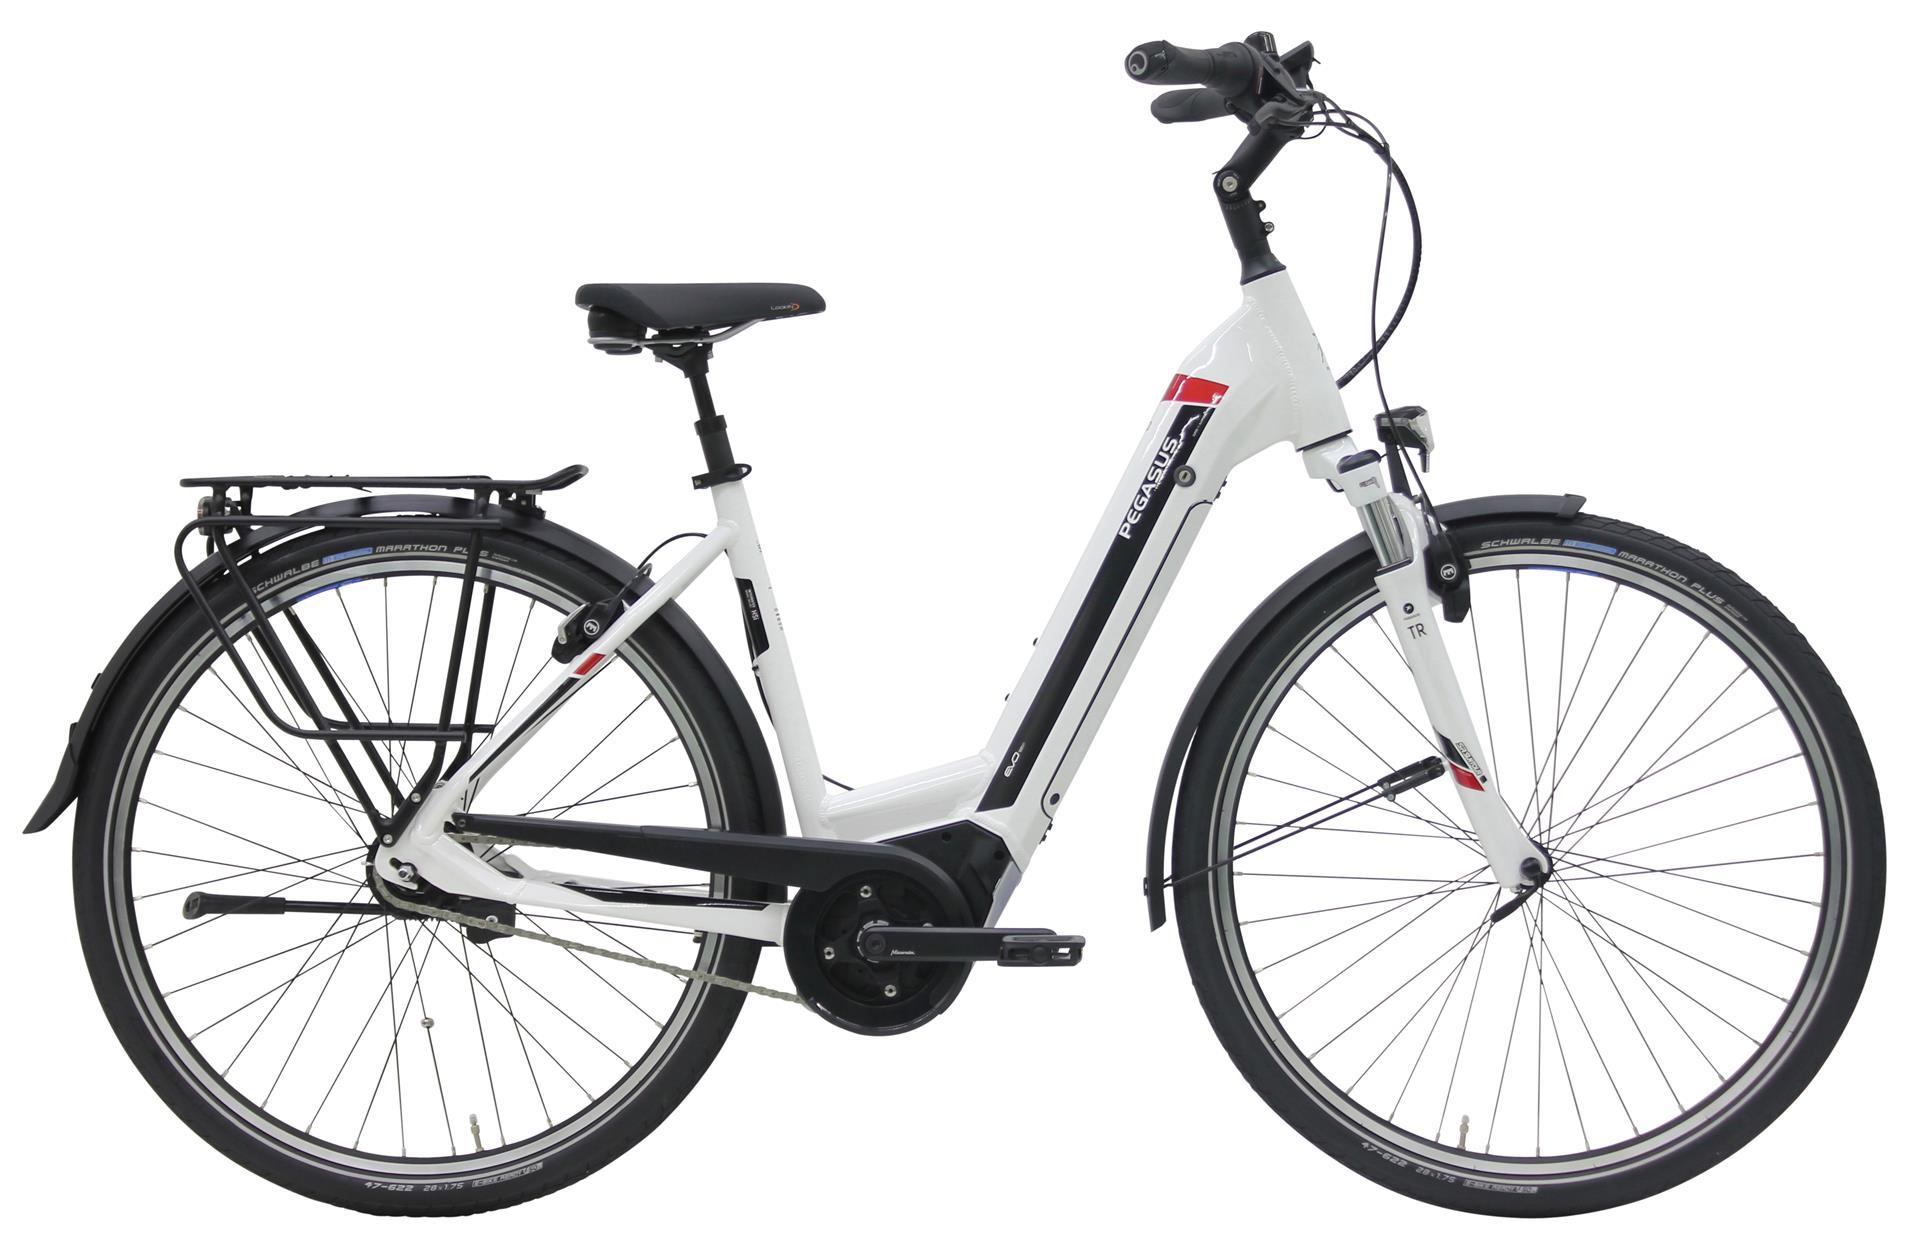 pegasus premio evo 8r 13 45 ah damen wei 2019 e bikes. Black Bedroom Furniture Sets. Home Design Ideas